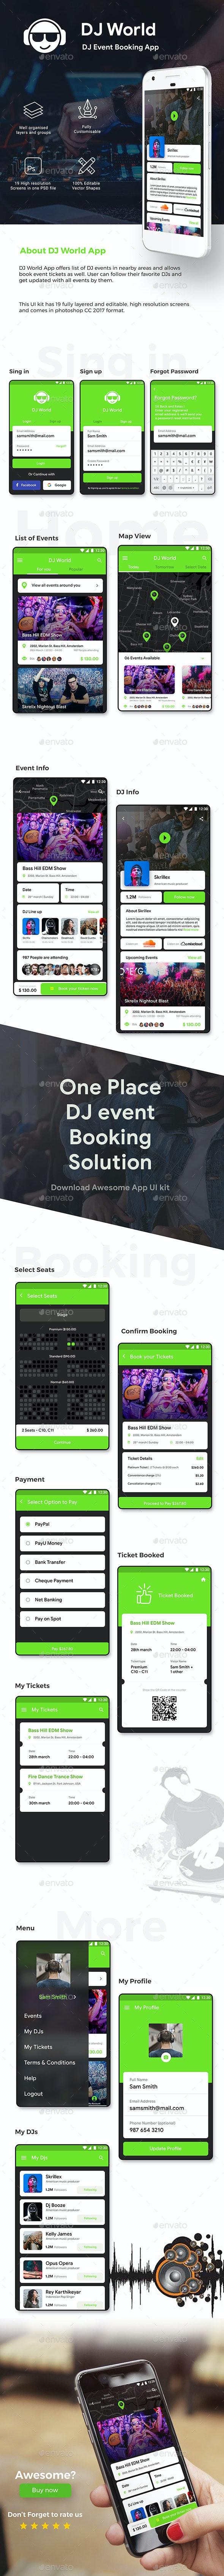 DJ Event Booking App UI Kit | DJ World - User Interfaces Web Elements